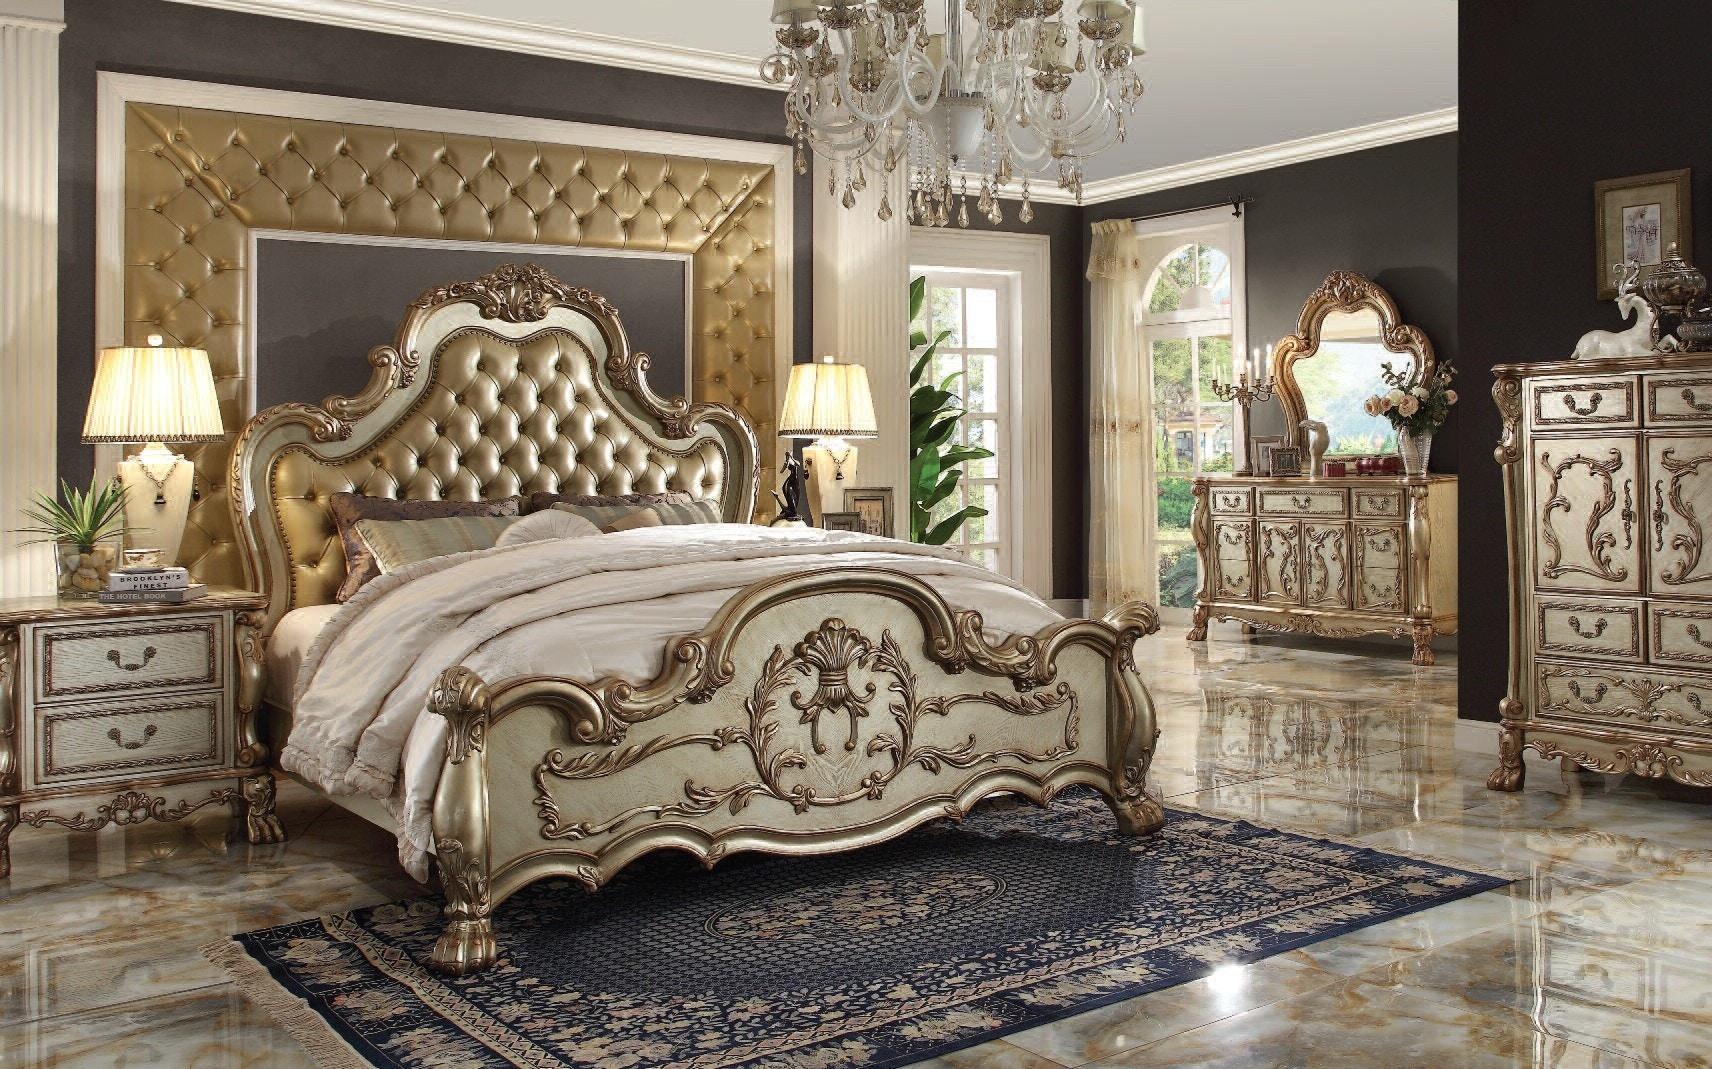 23157/23165/23164. Dresden Gold Patina 5pc Bedroom Set